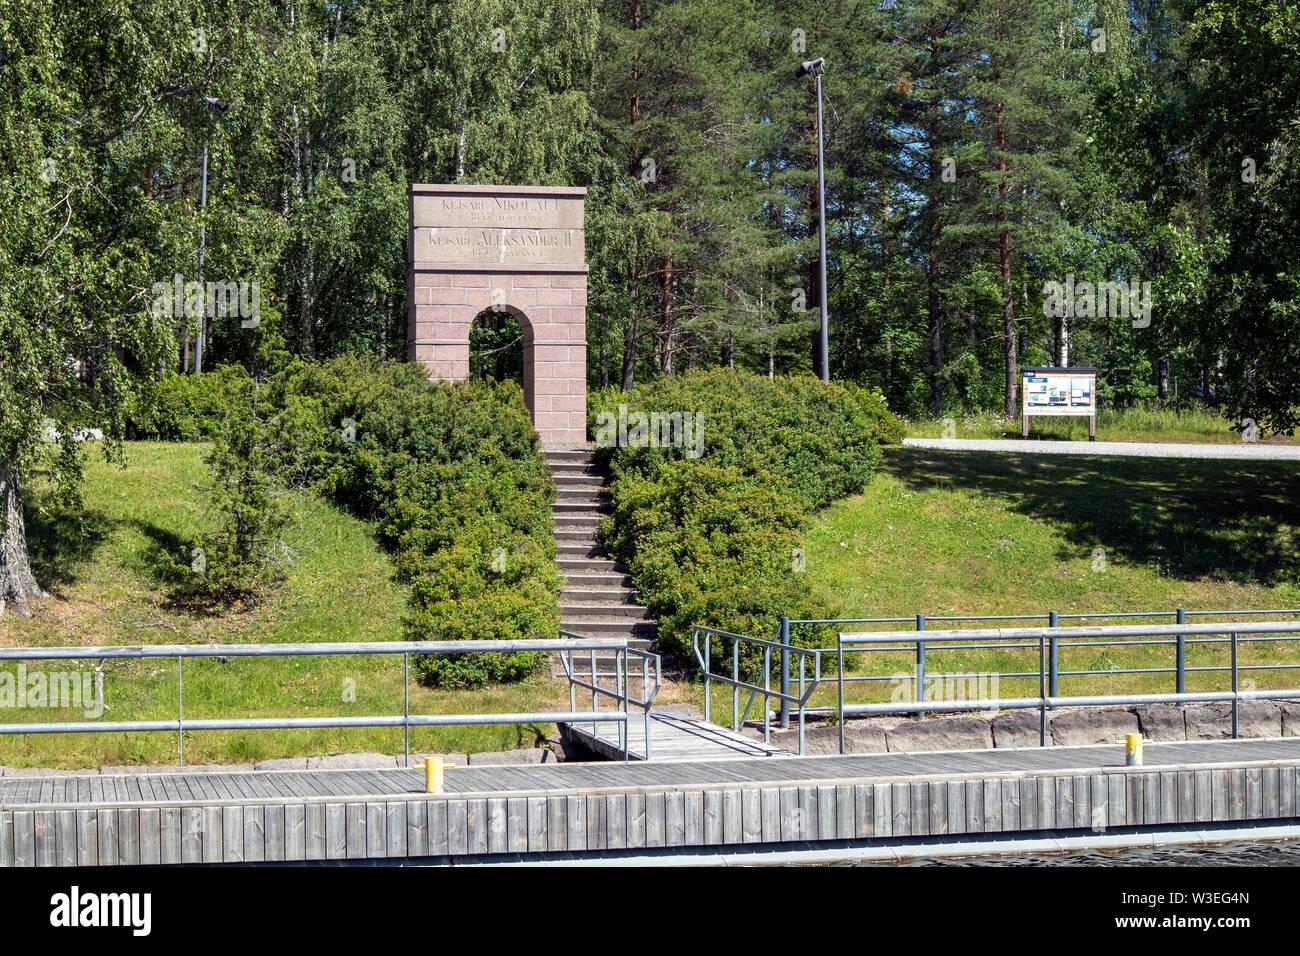 The Saimaa canal 150 years memorial, Lappeenranta Finland - Stock Image